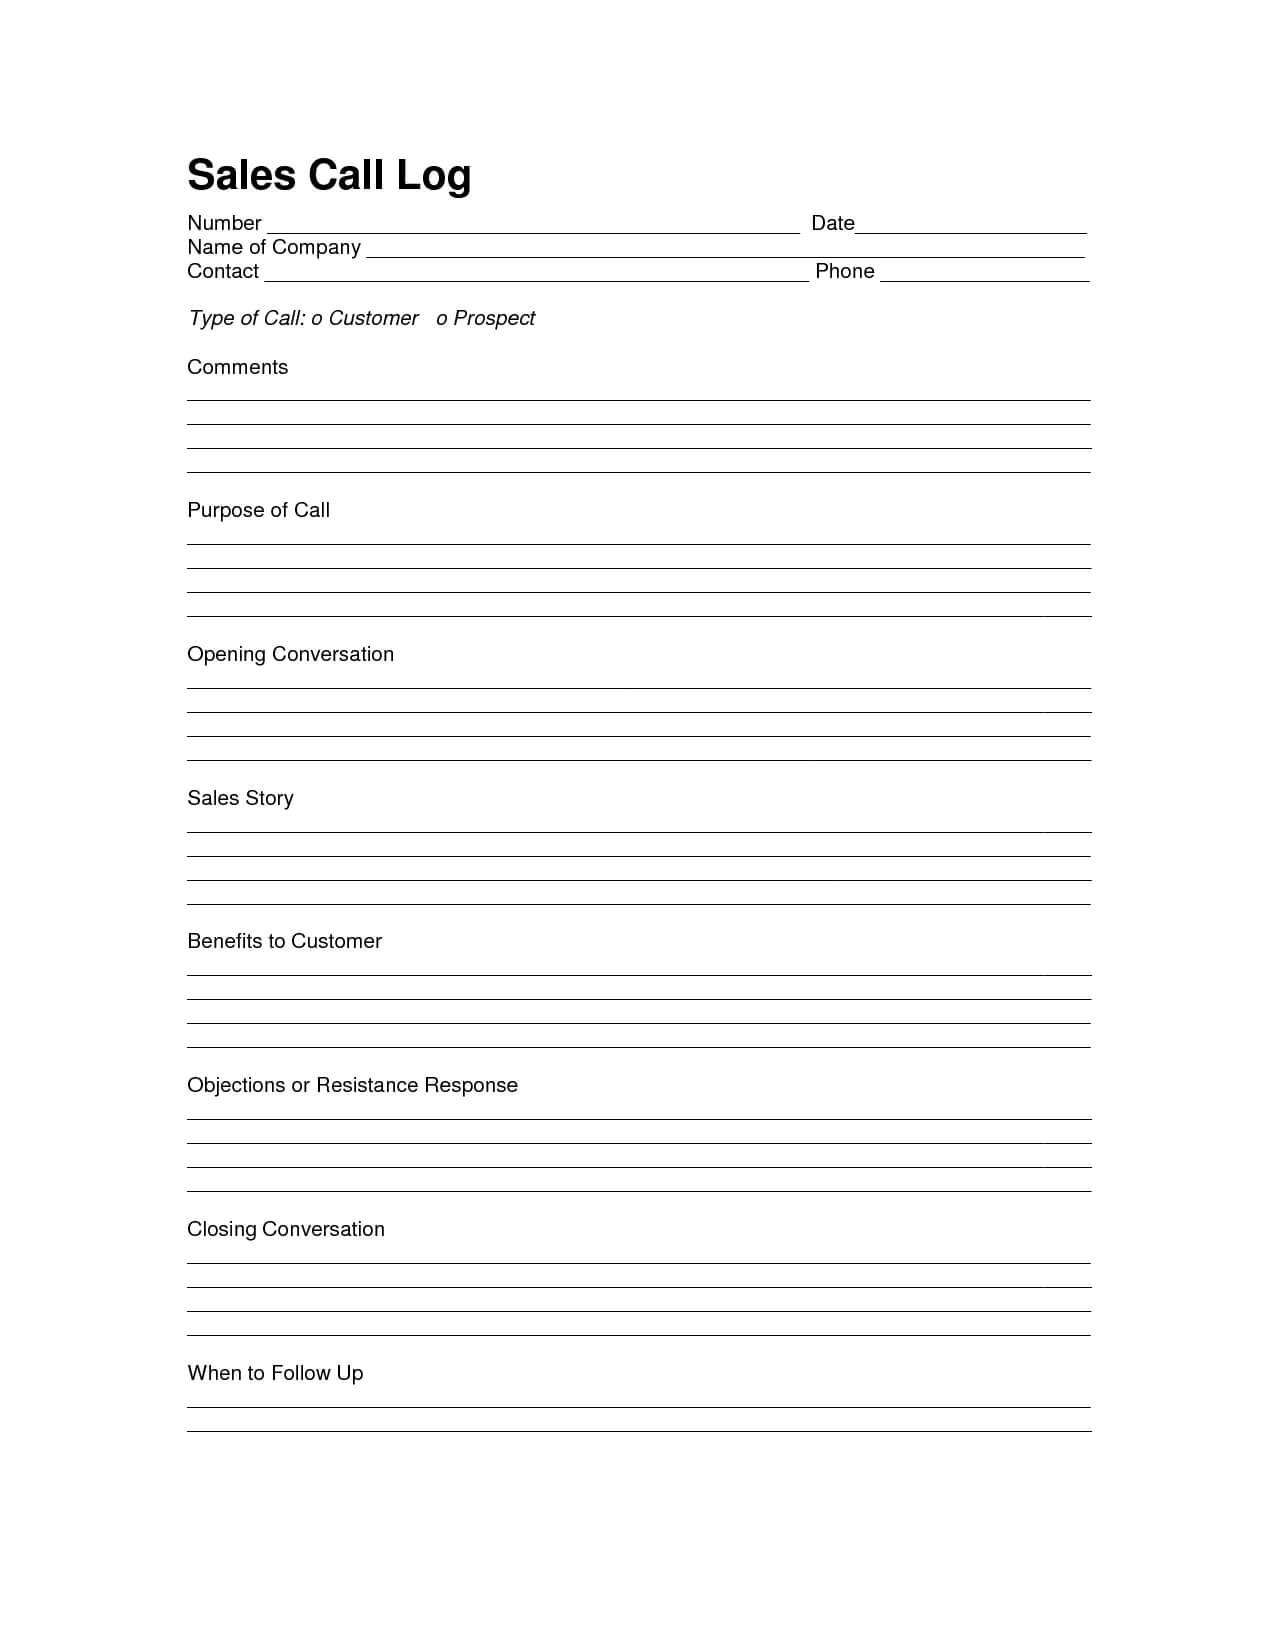 Sales Log Sheet Template | Sales Call Log Template | Sales Pertaining To Sales Call Report Template Free